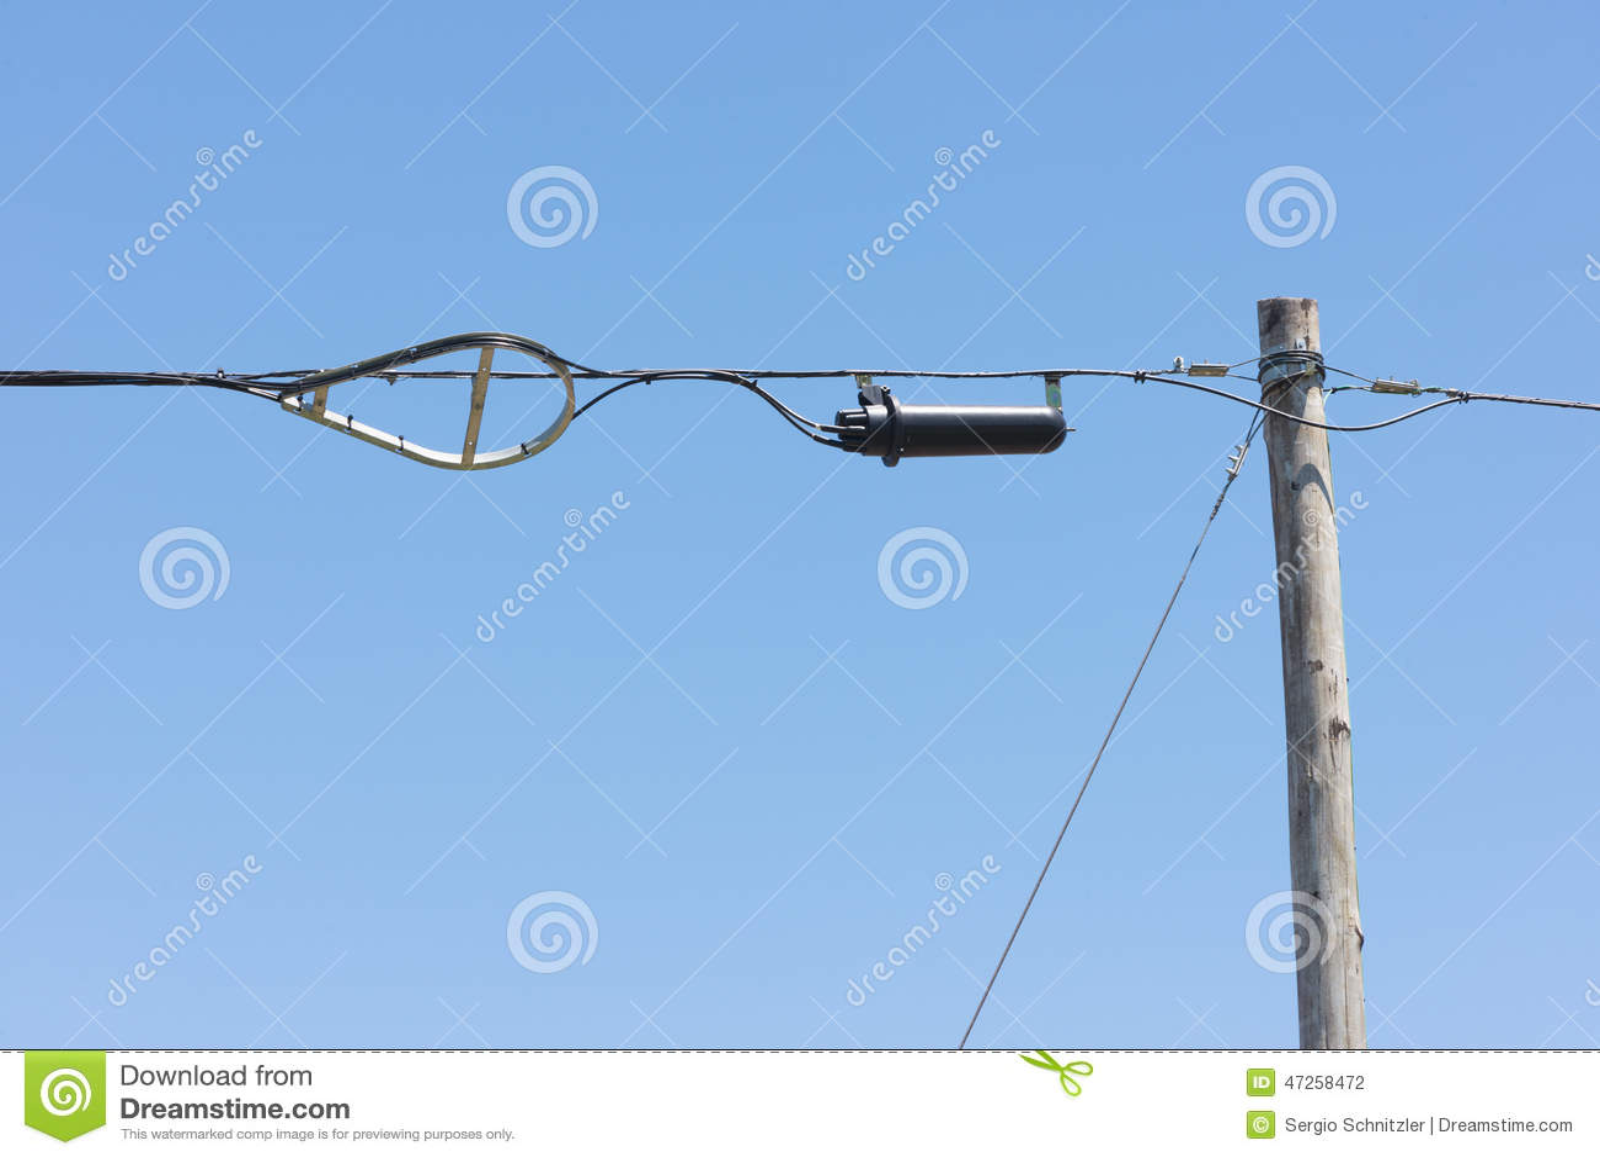 Utility Poles Hacker News